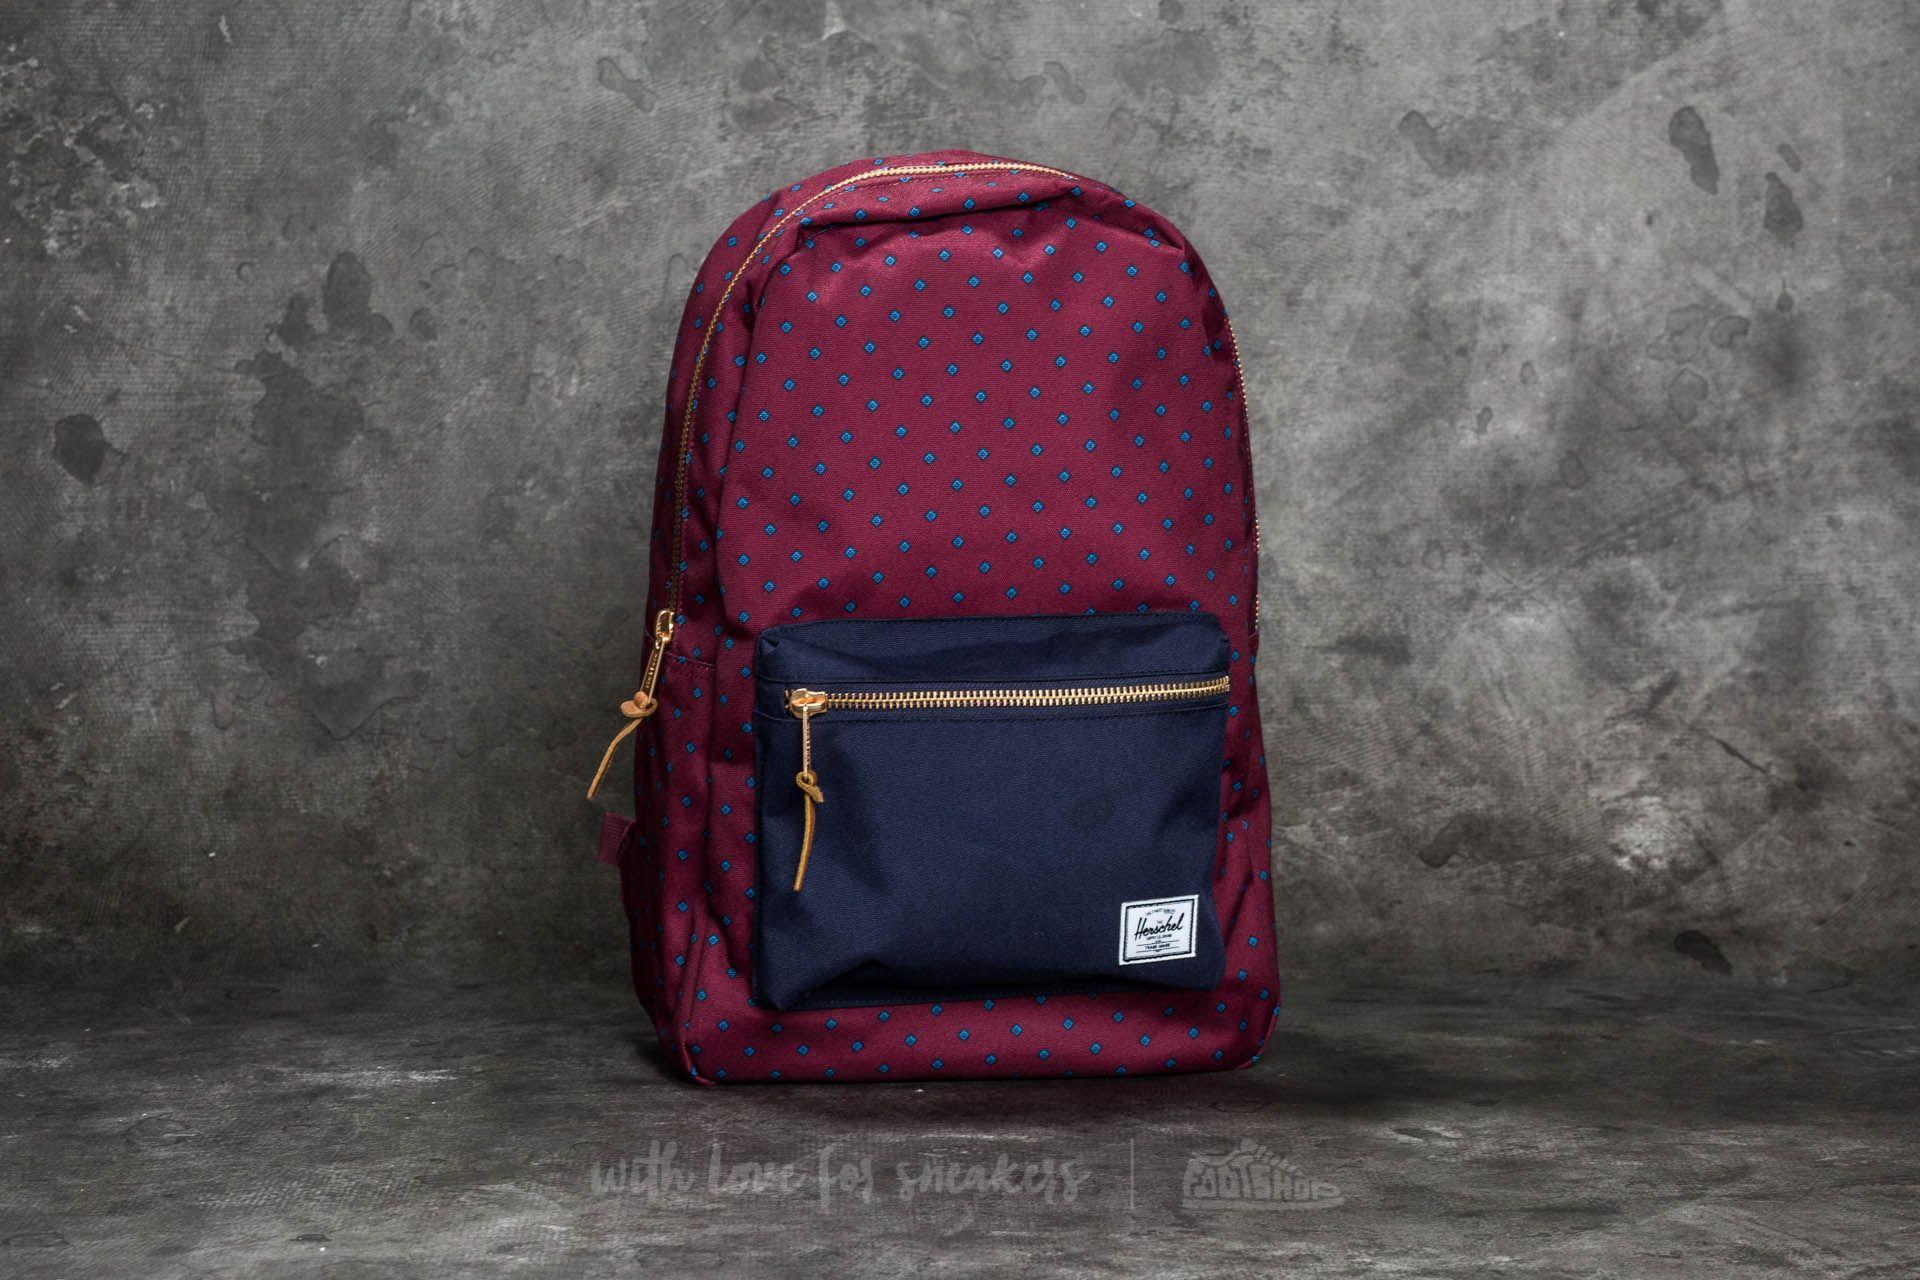 bf067090b1d Herschel Supply Co. Settlement Backpack. University Windsor Wine  Peacoat